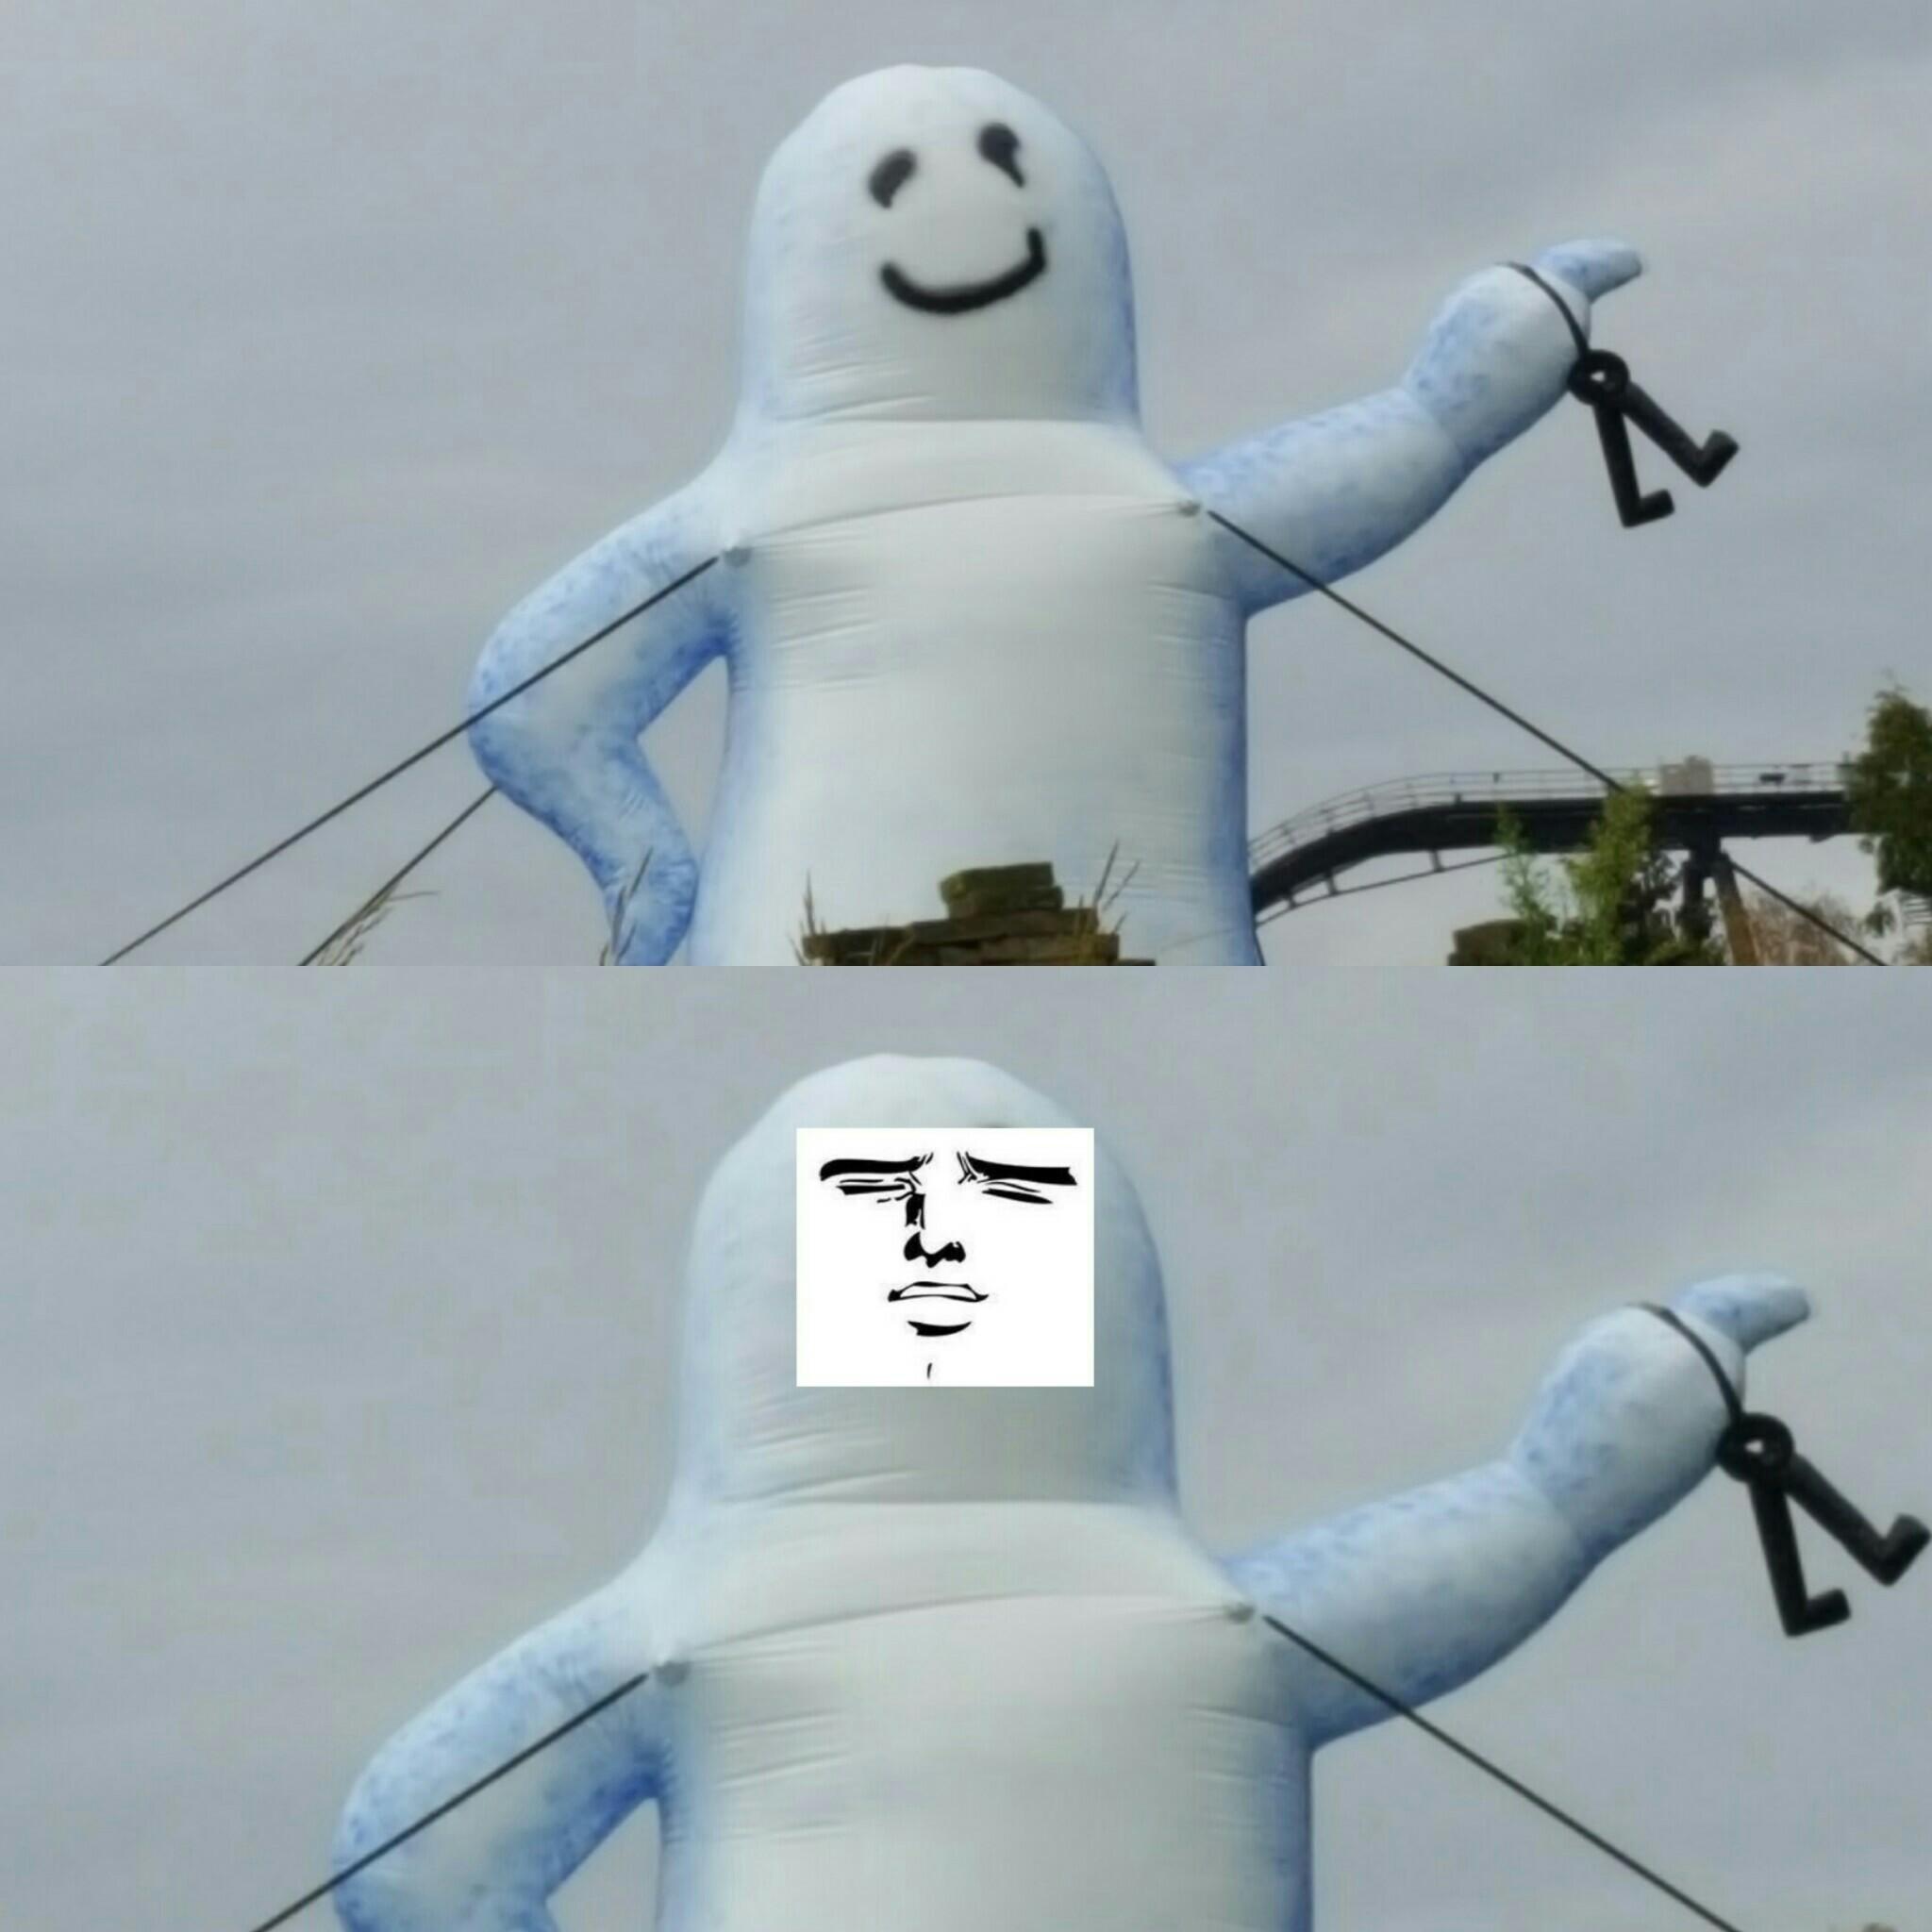 Spoopy nipple clamps - meme